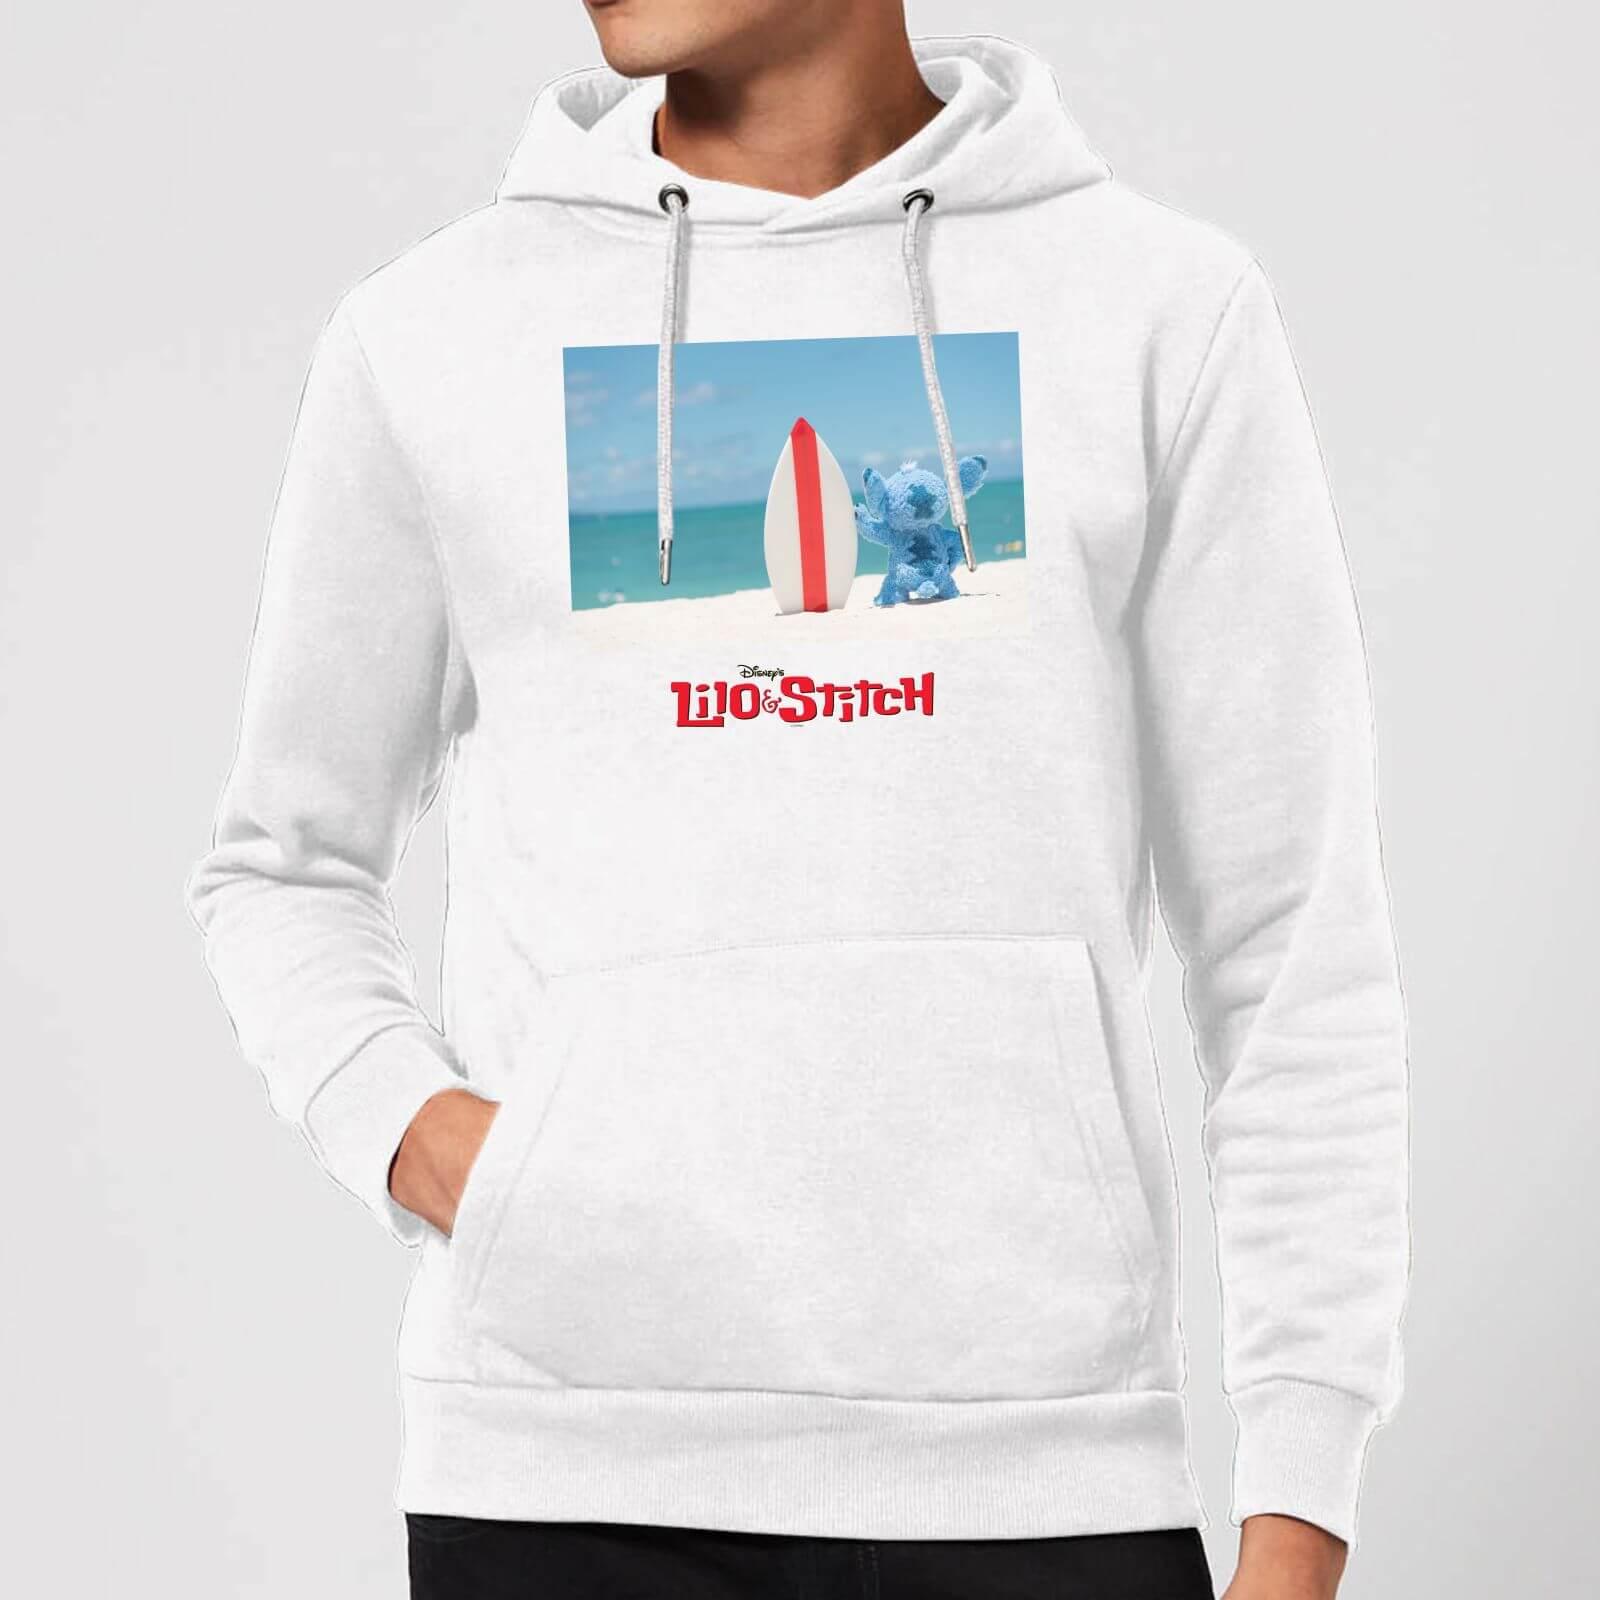 cb1a54ebf0 Disney Lilo And Stitch Surf Beach Hoodie - White